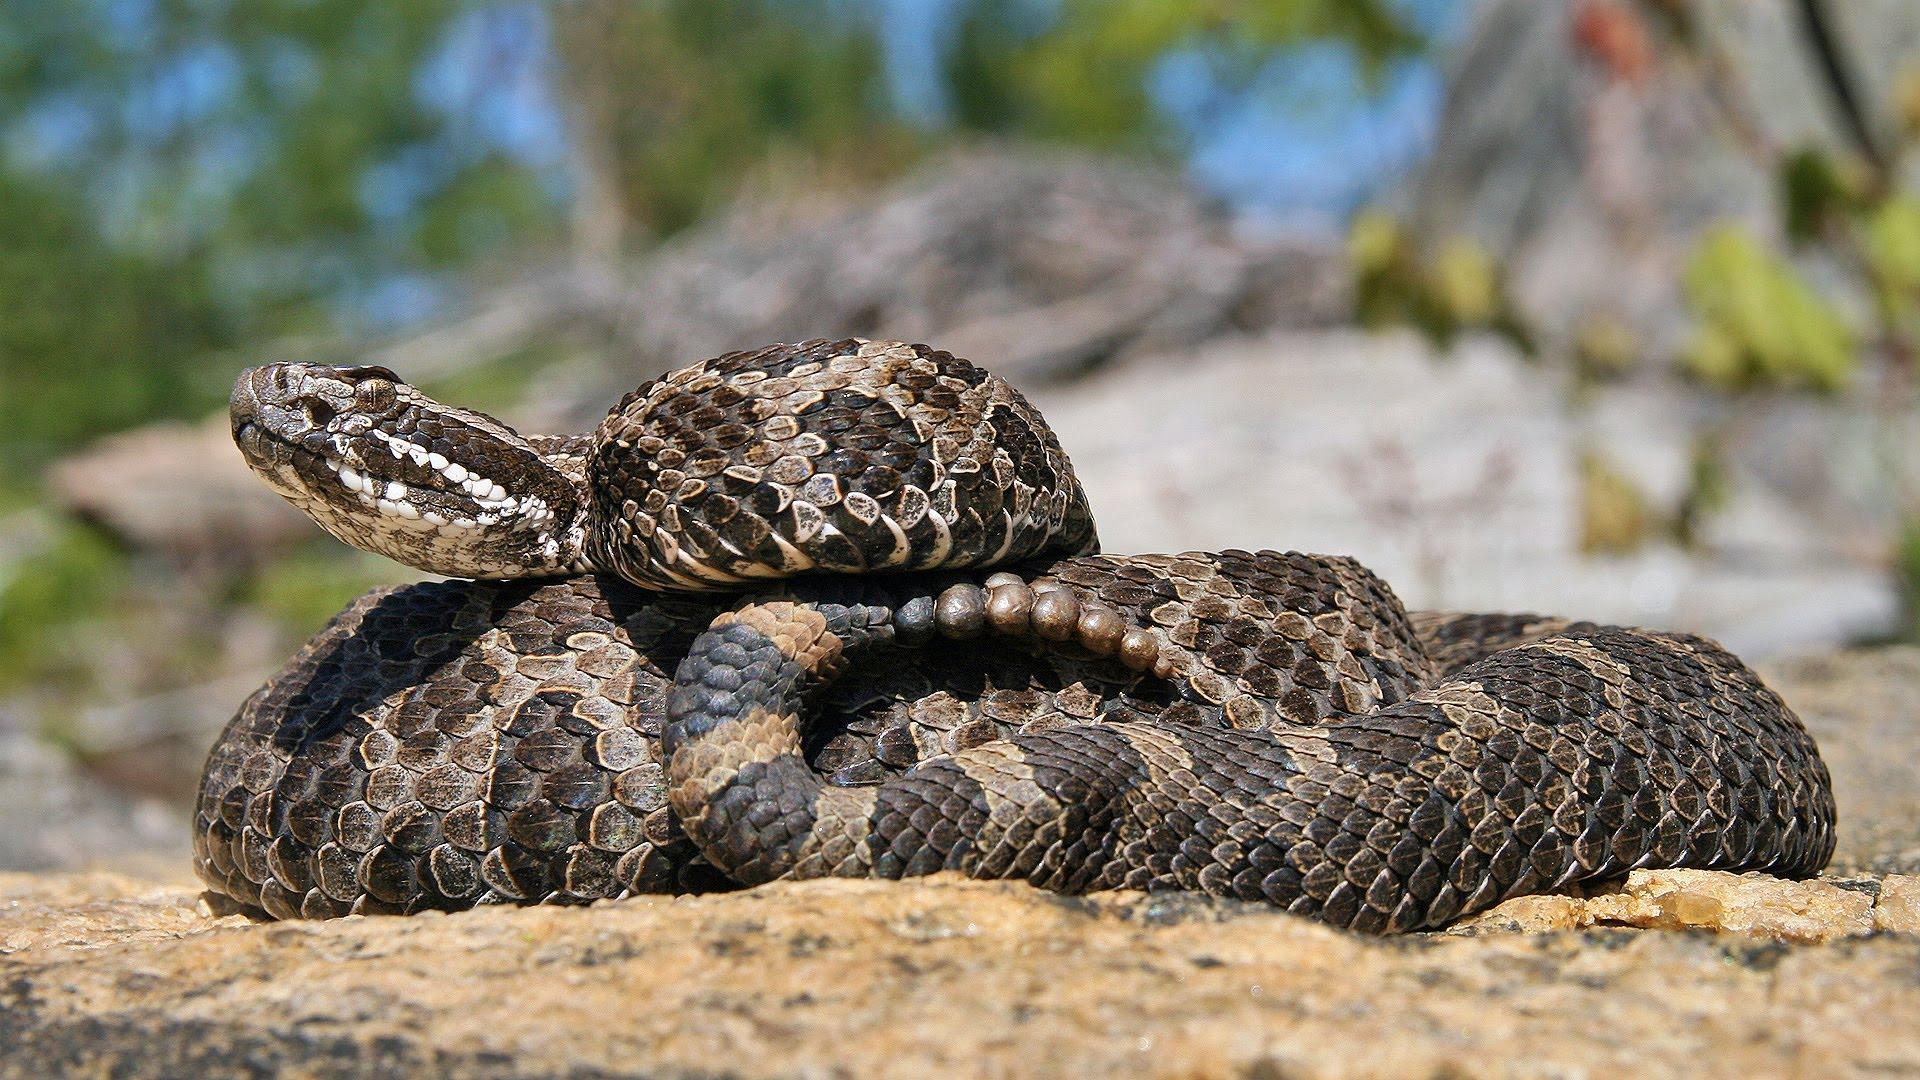 Rattle_snake_youtubr.jpg